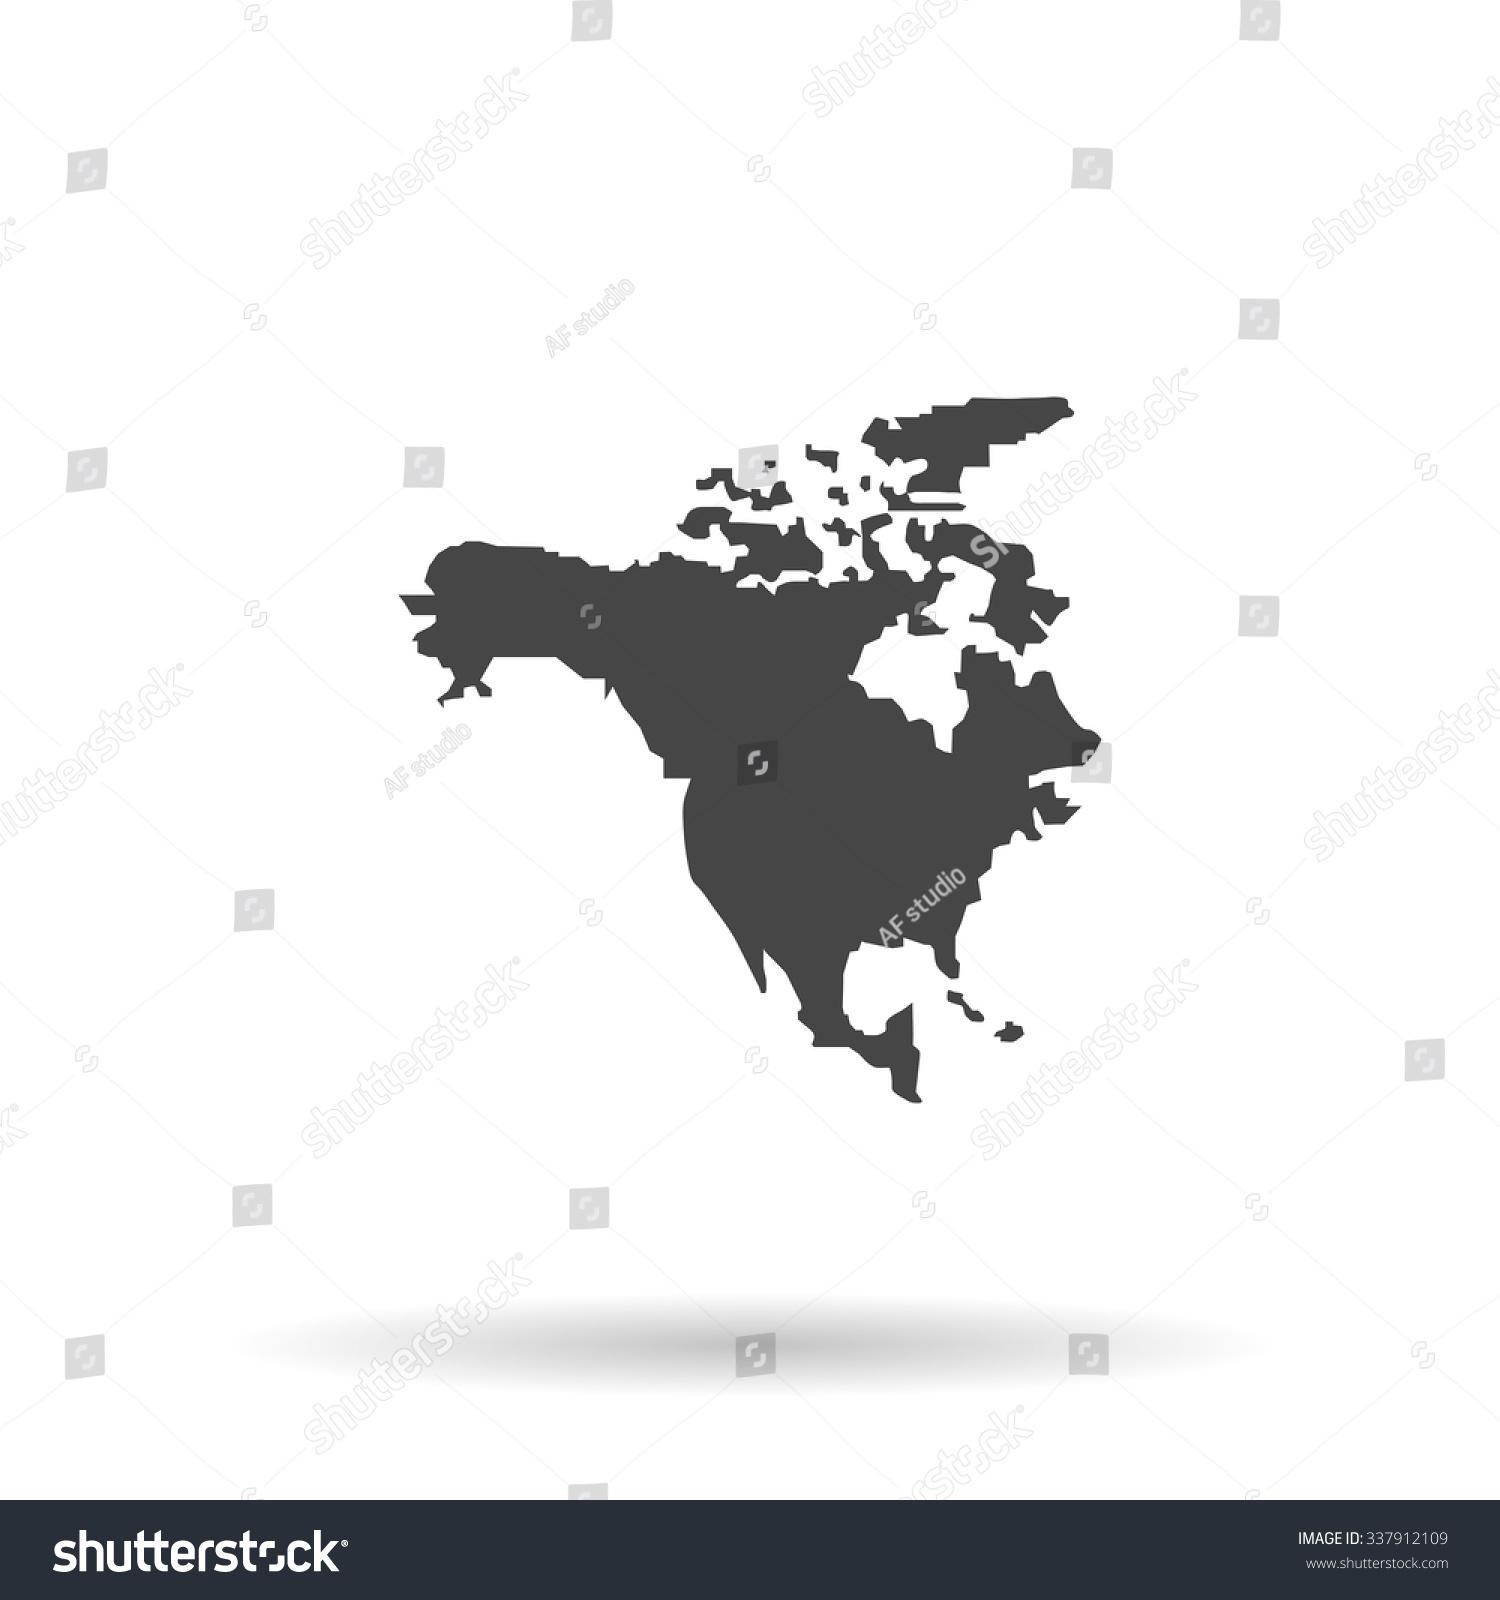 North America Map Icon Vector Stock Vector 337912109 Shutterstock